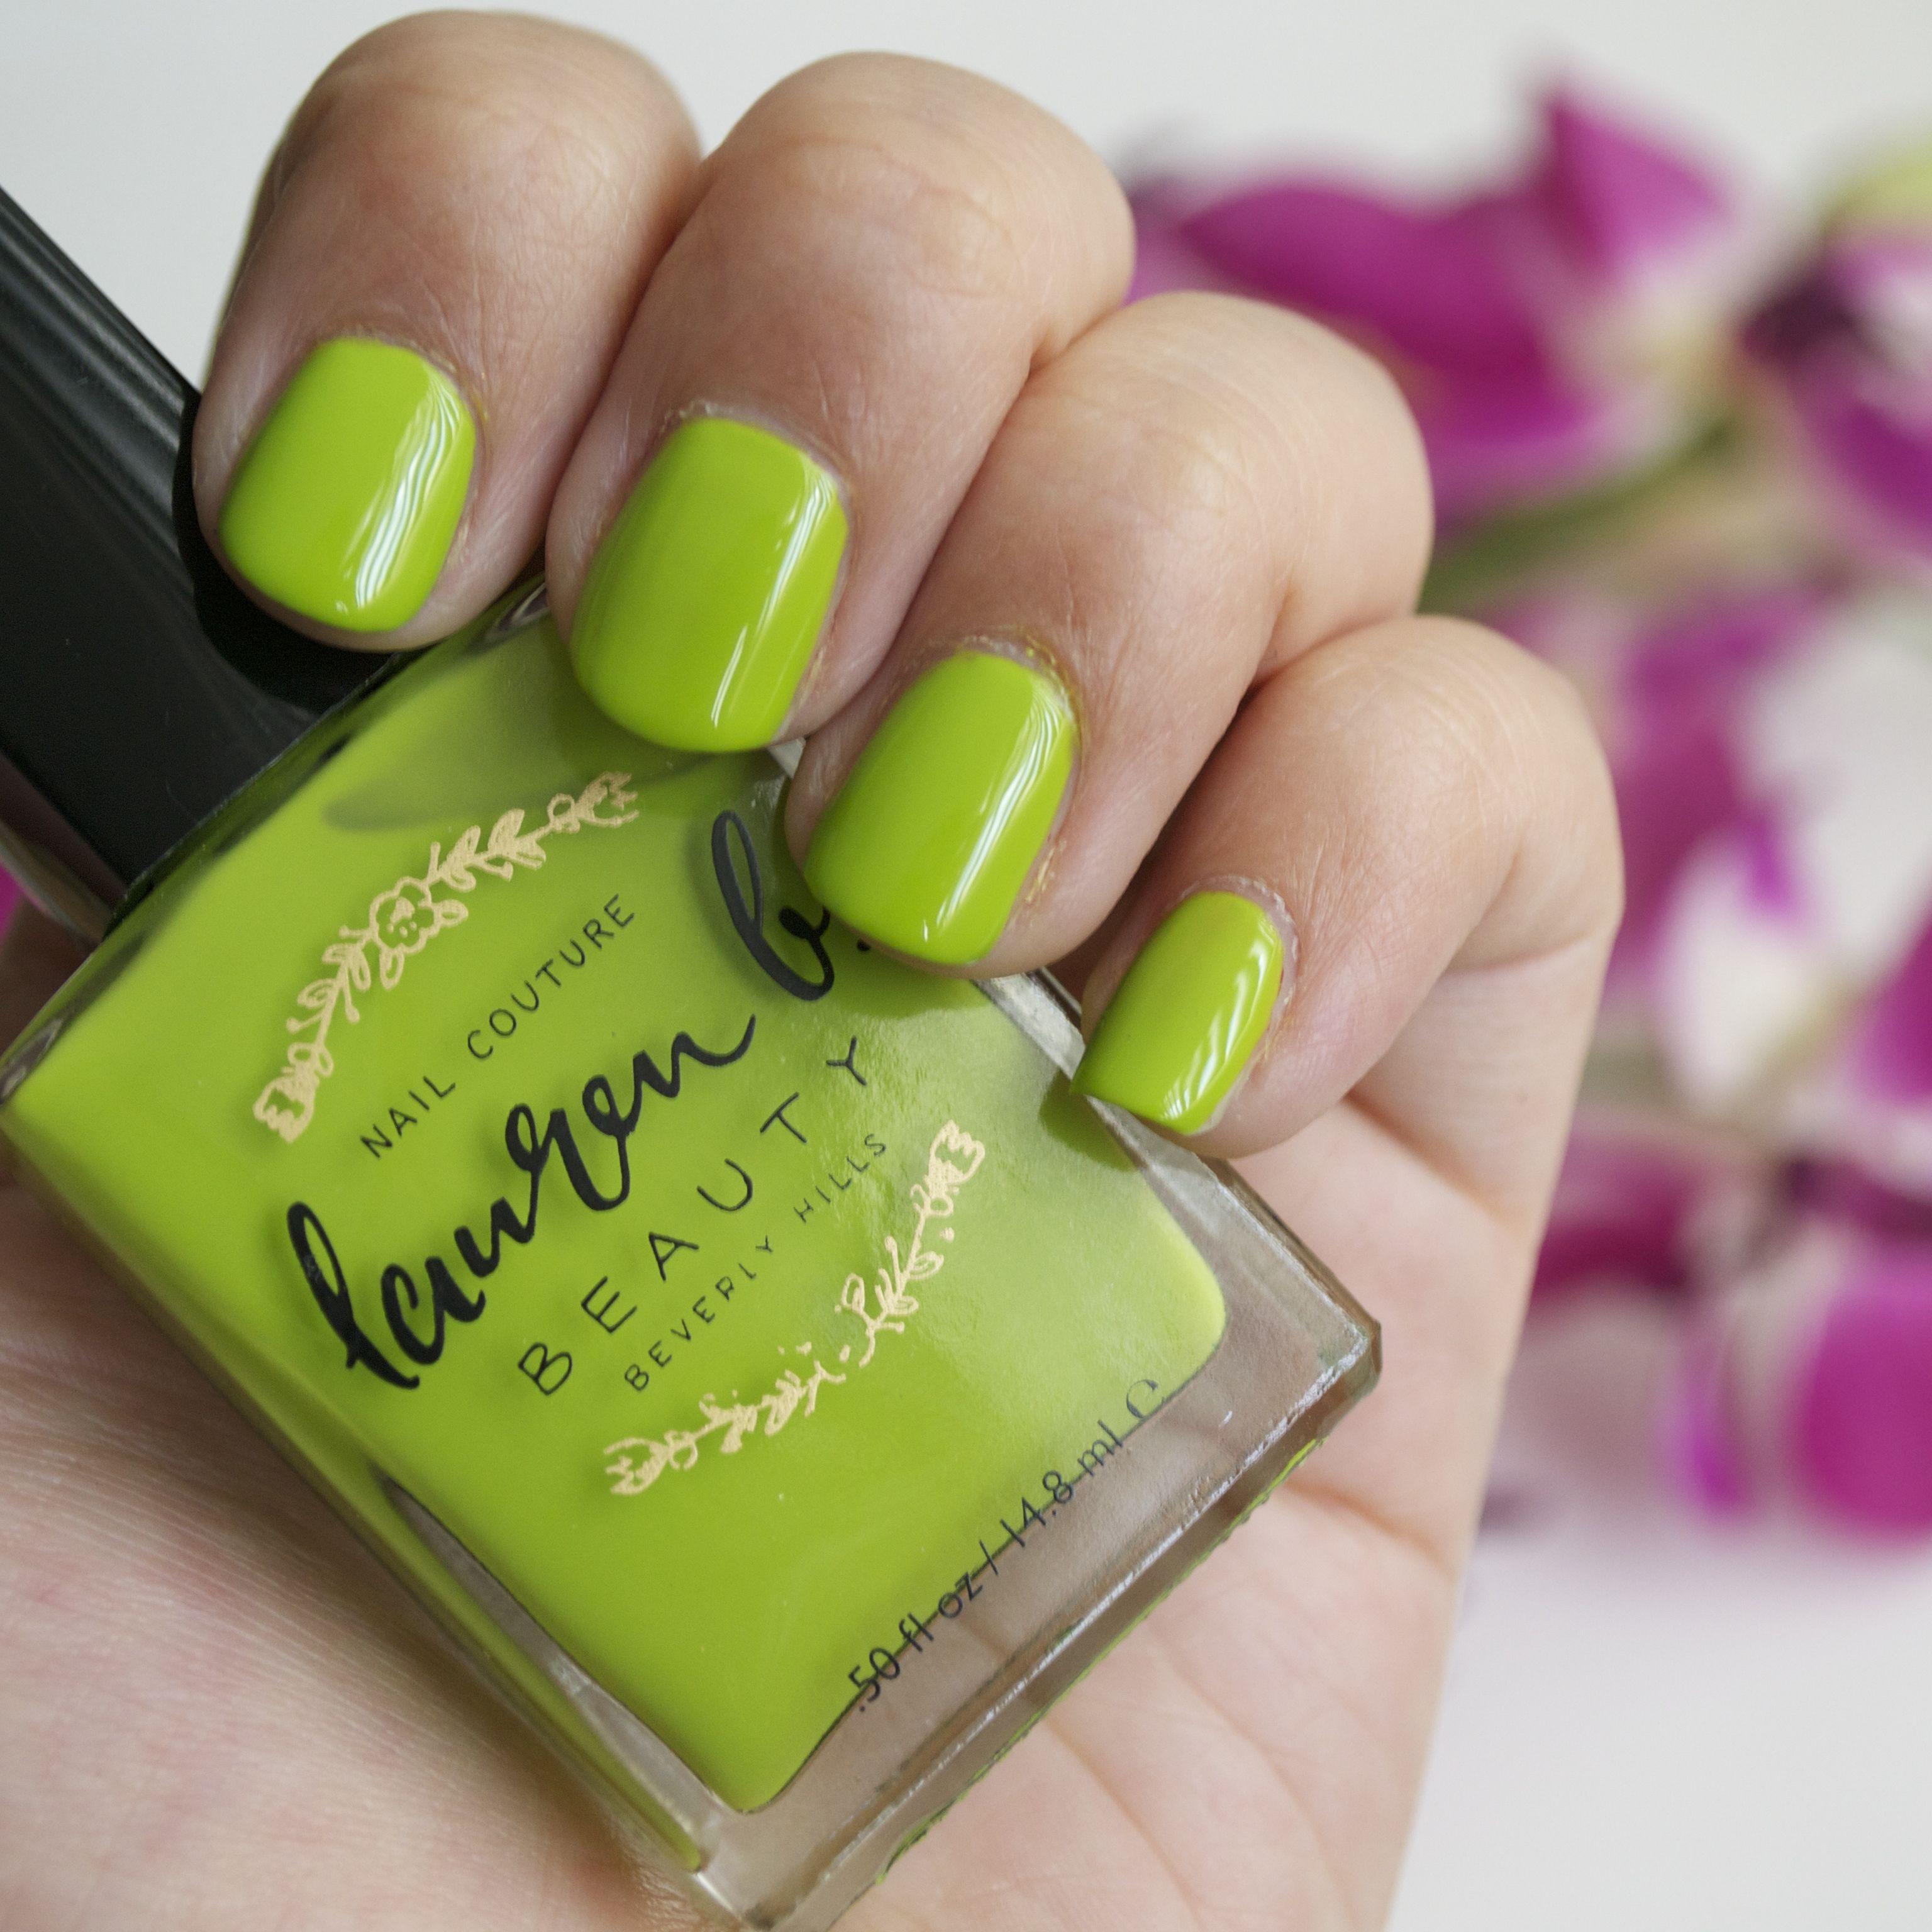 Lauren B Beauty #ImJuicing | Nail Swatches | Pinterest